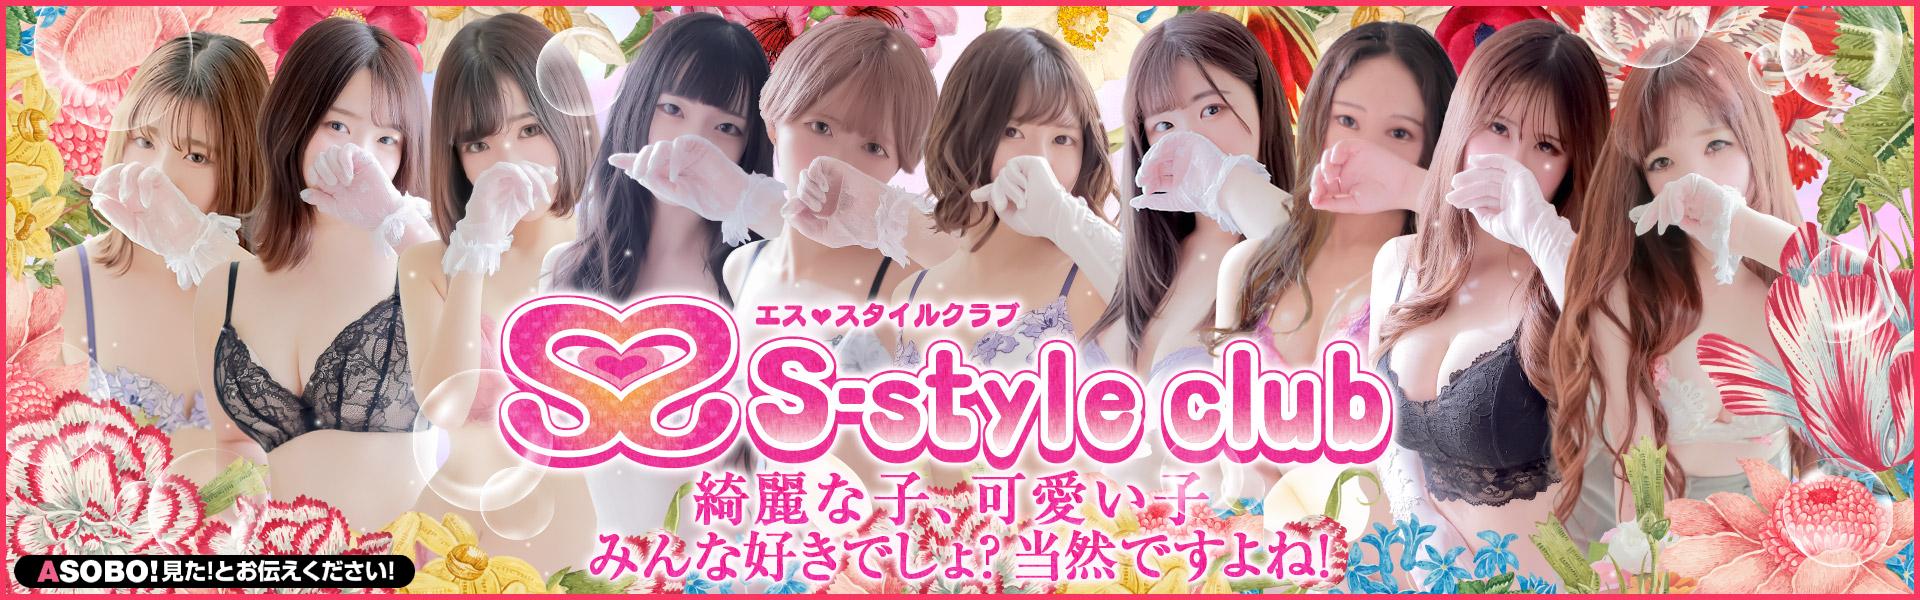 S-style club -エススタイルクラブ-